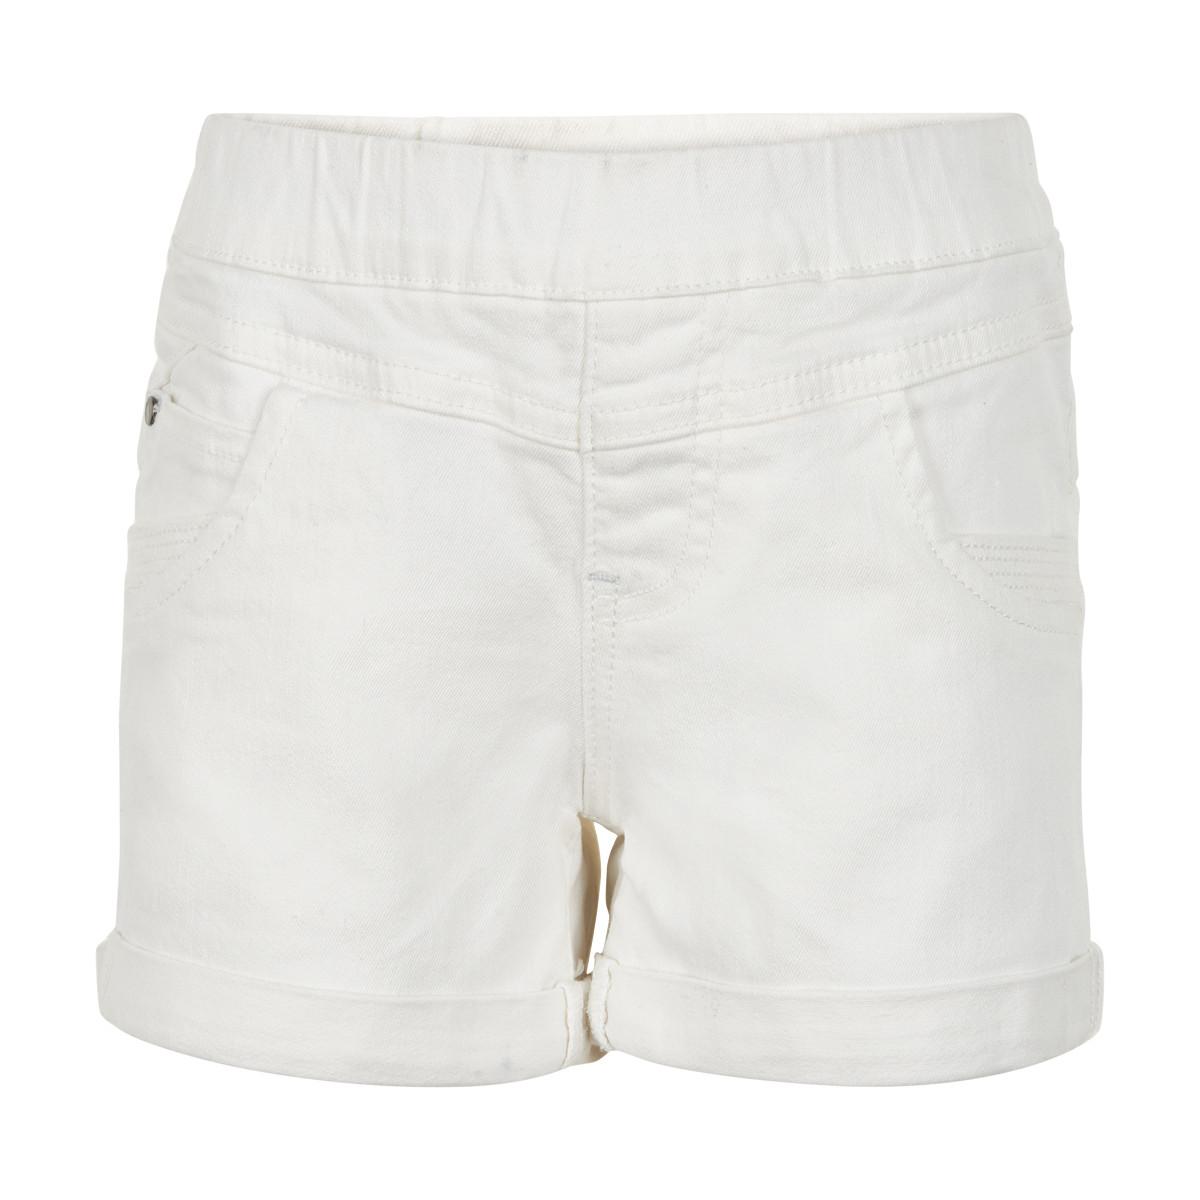 Creamie | Shorts | 4-14y | 821087-1103